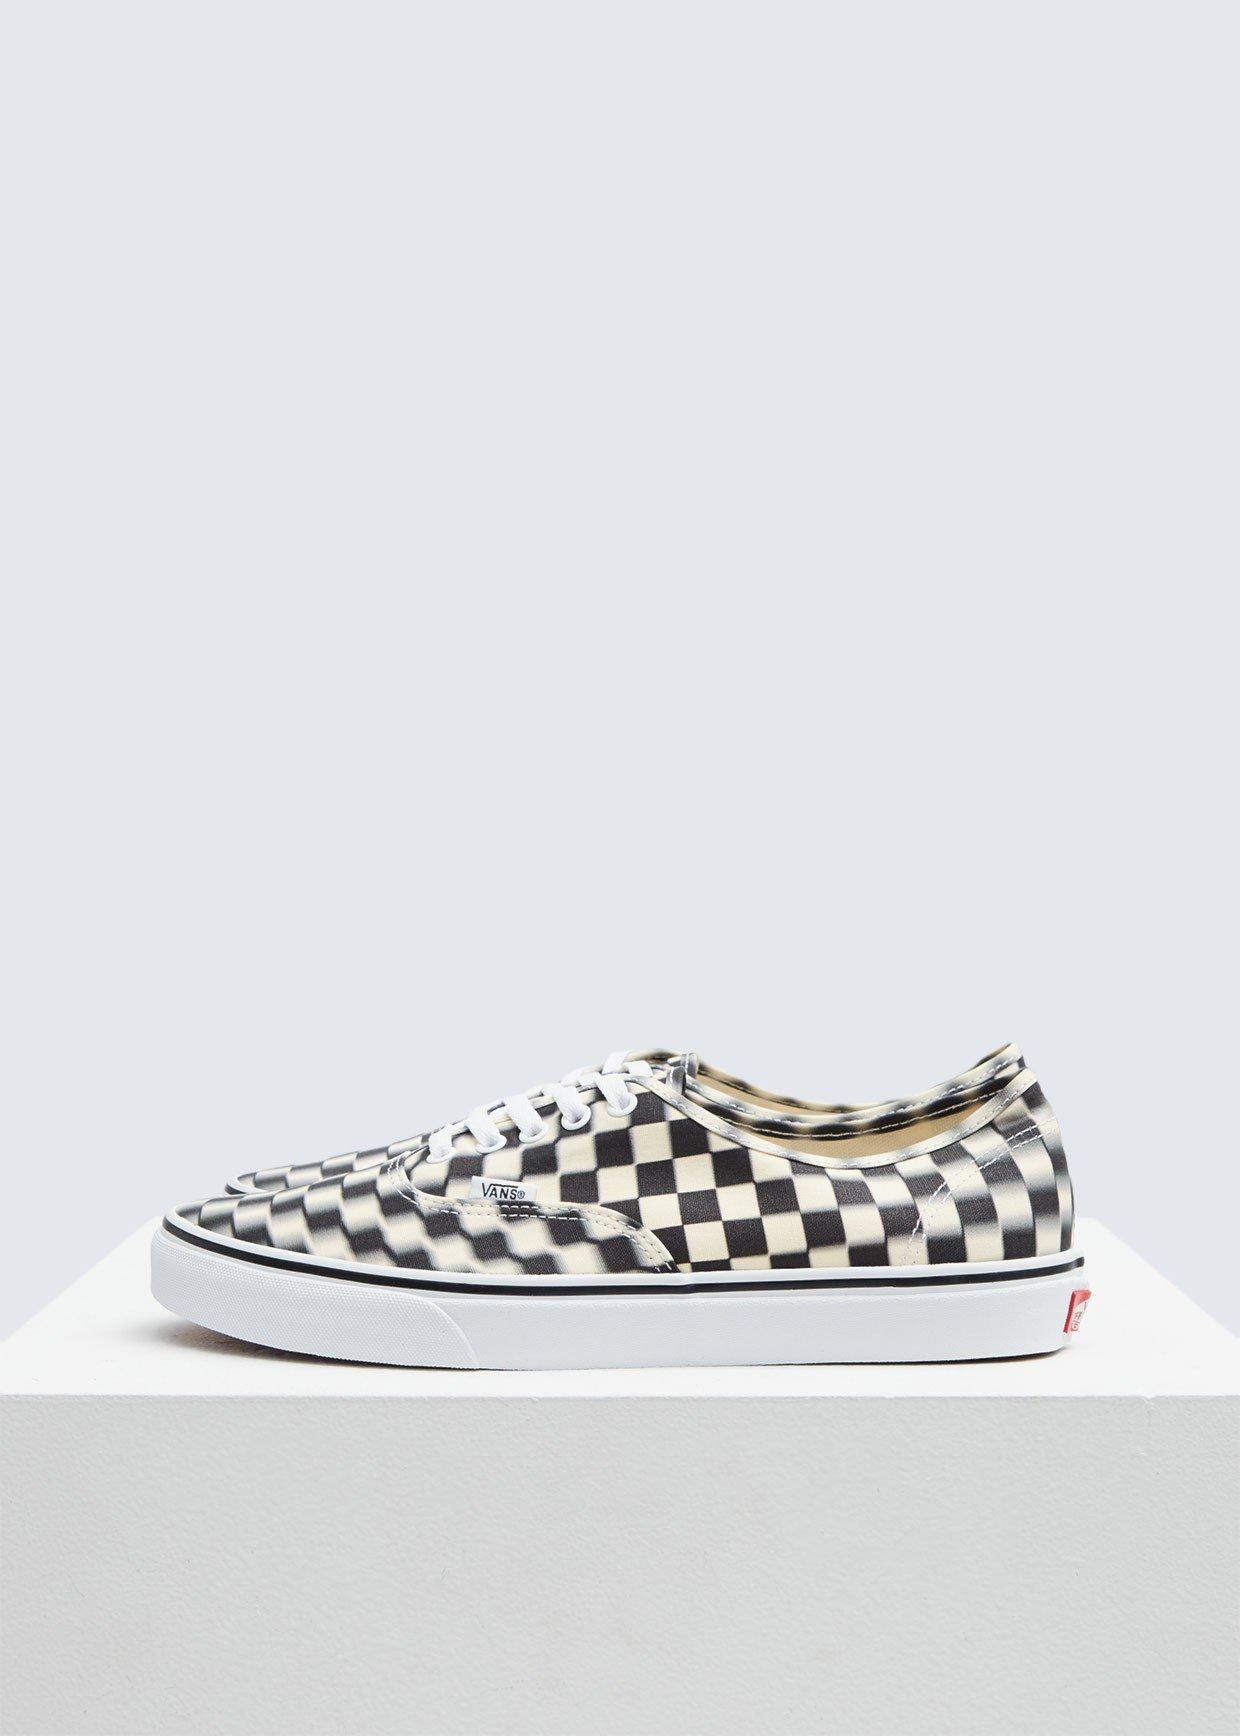 87c9b4d54a1027 Vans Authentic Sneaker in White for Men - Lyst